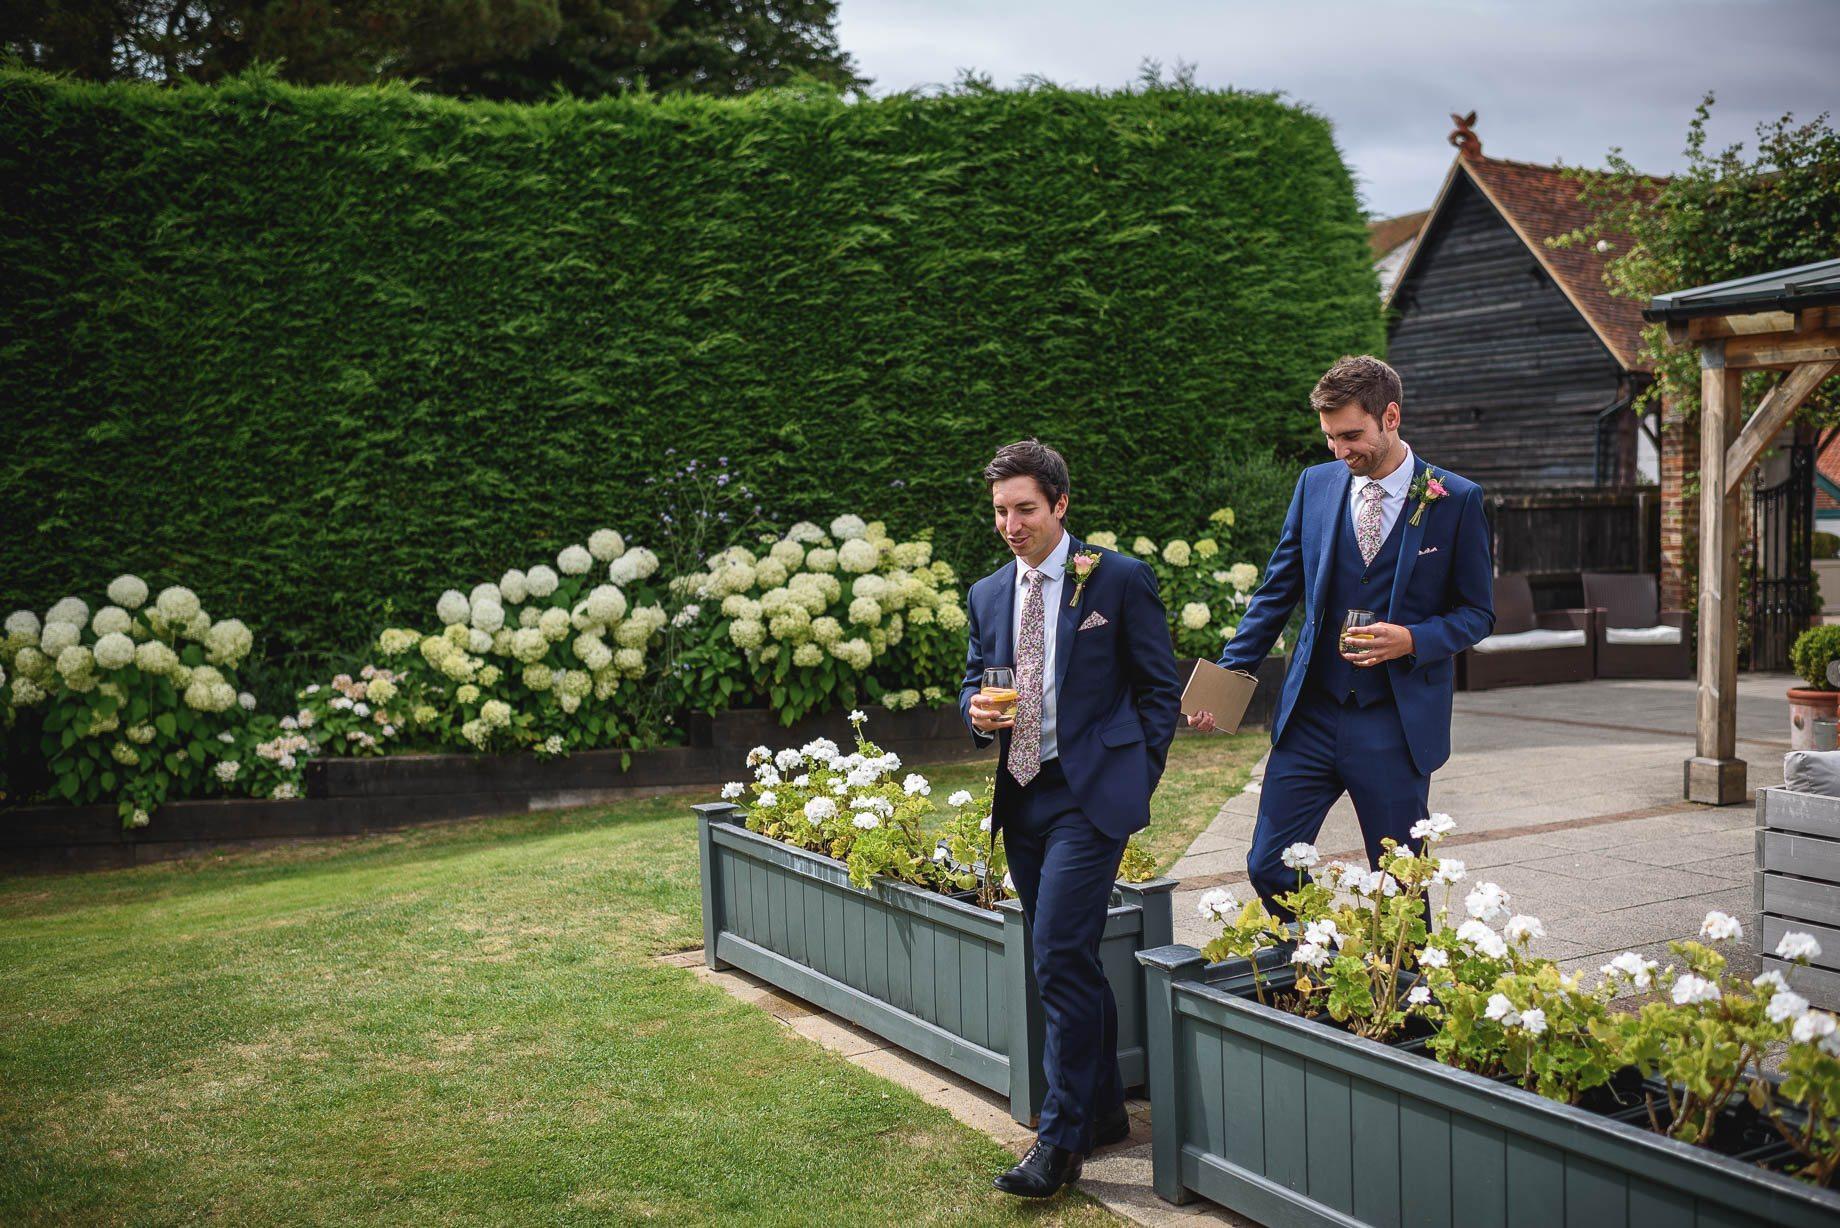 Gaynes Park wedding photography - Guy Collier Photography - Rachel and Jon (87 of 169)